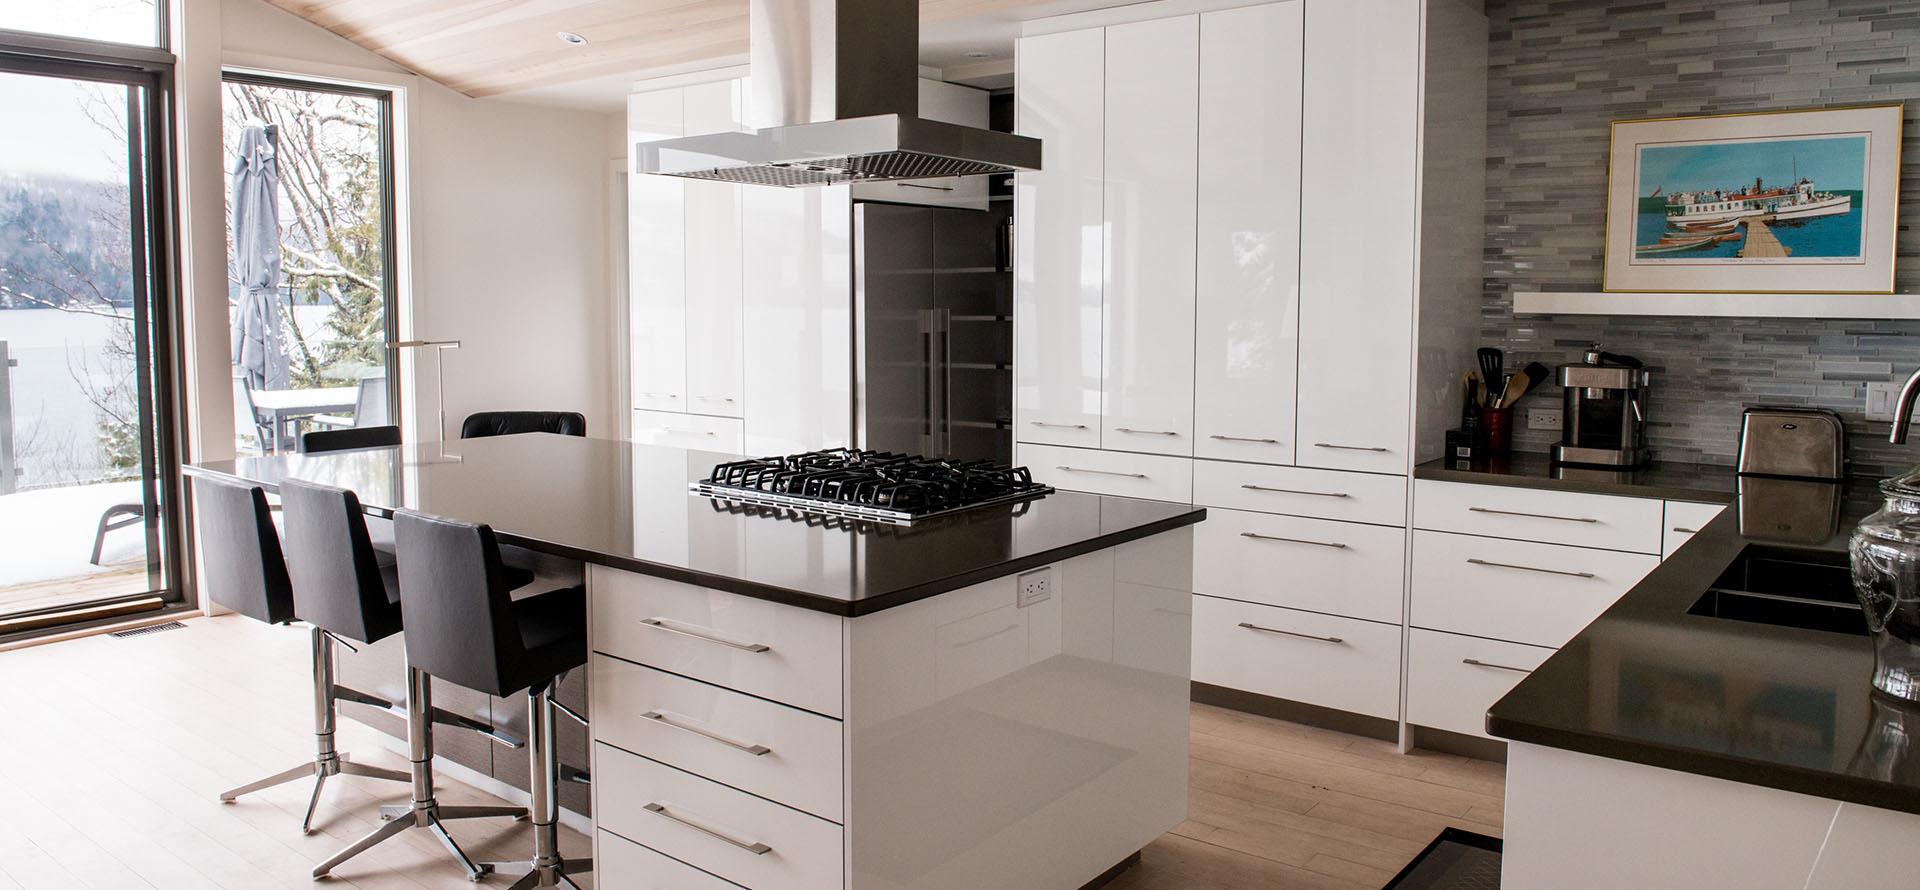 style moderne avec fini lustre blanc a north hatley